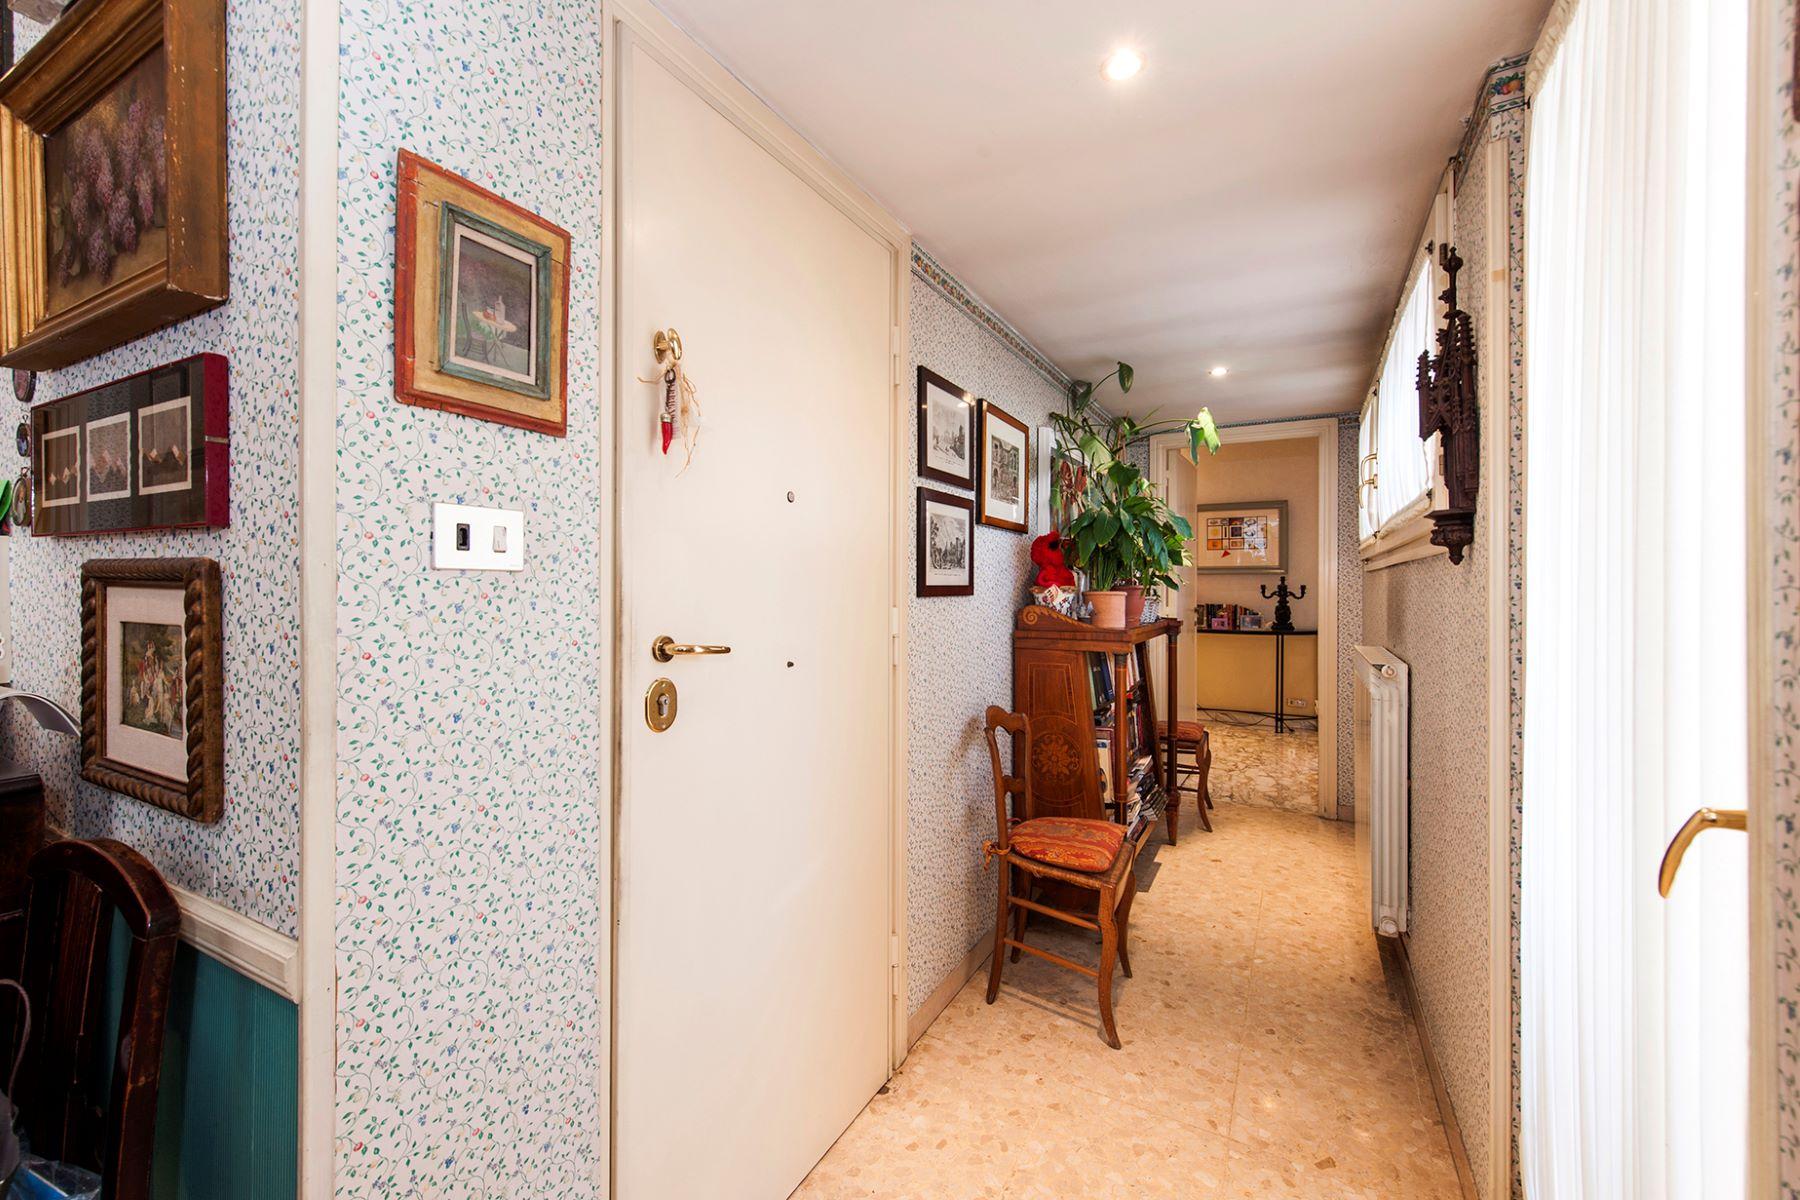 Additional photo for property listing at Elegant apartment in Viale Cortina d'Ampezzo  Rome, Roma 00135 Italia